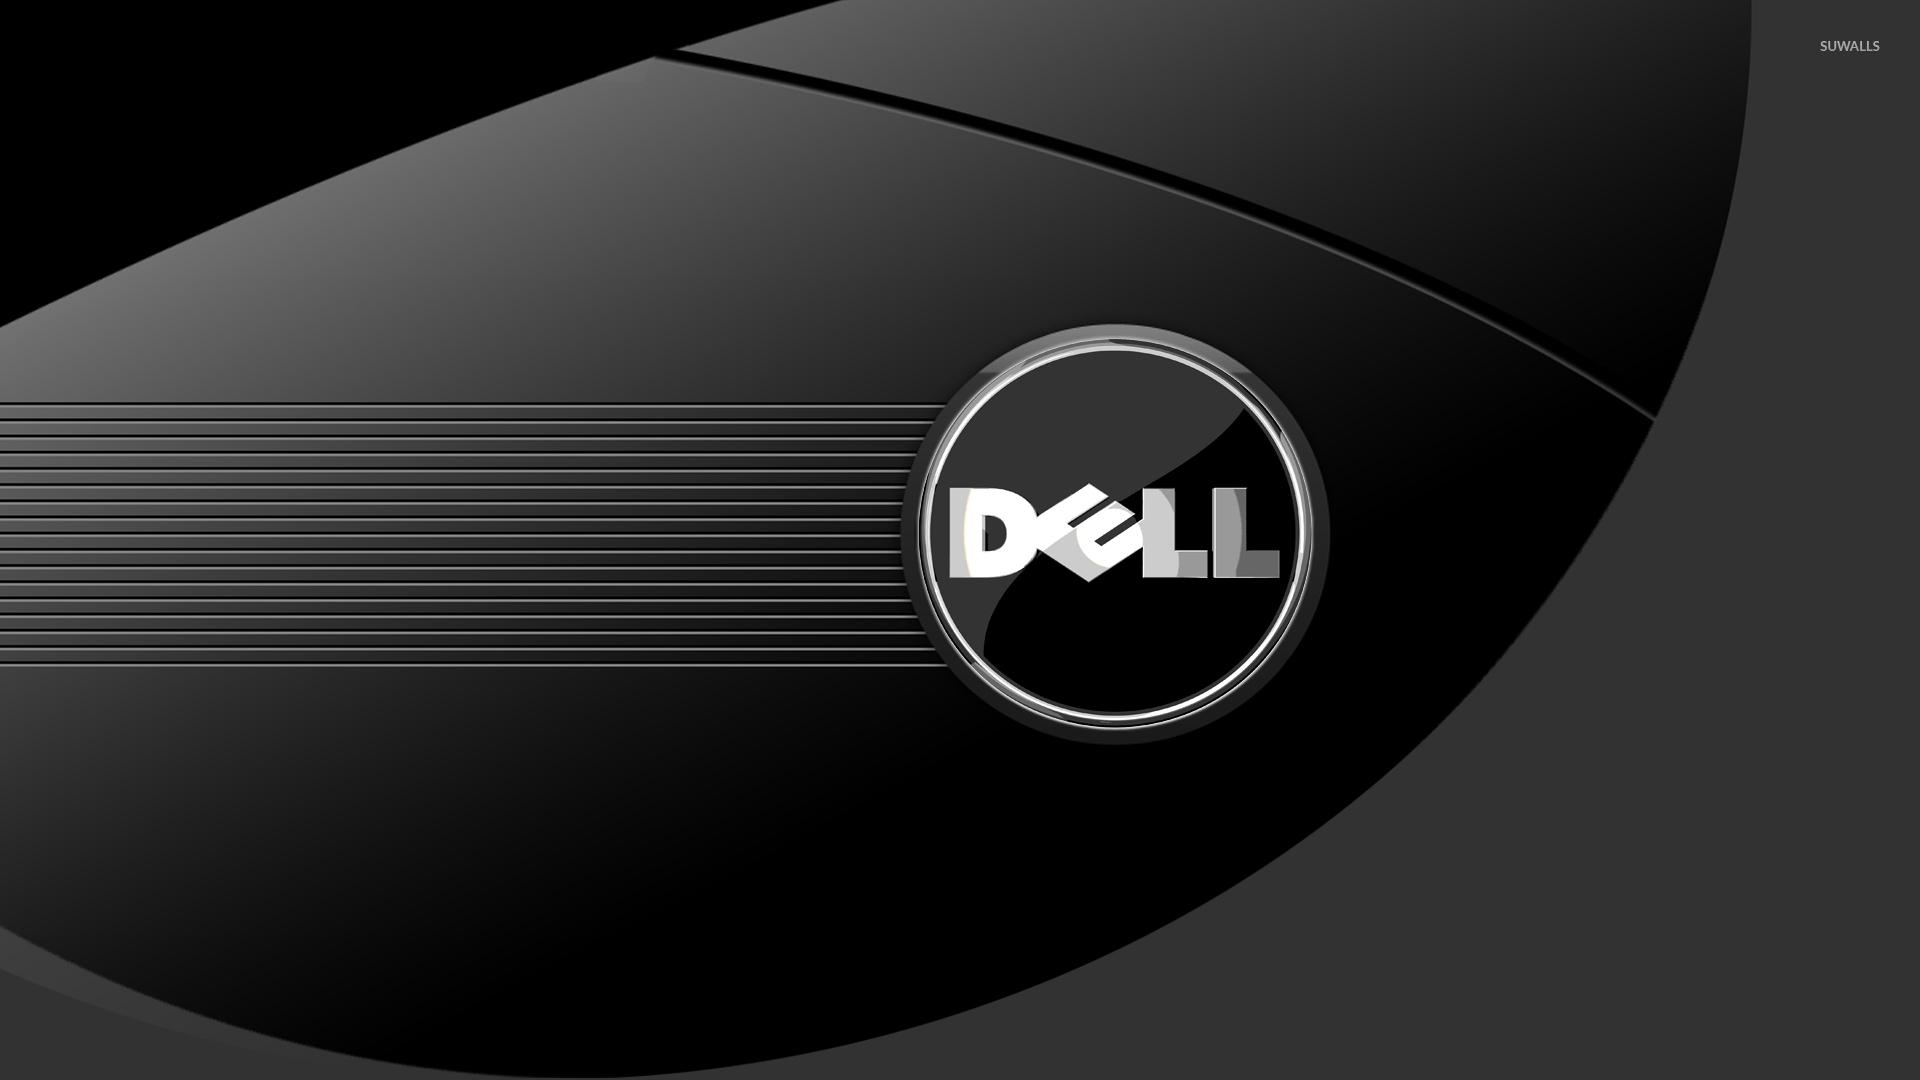 Dell Wallpaper 1280x800